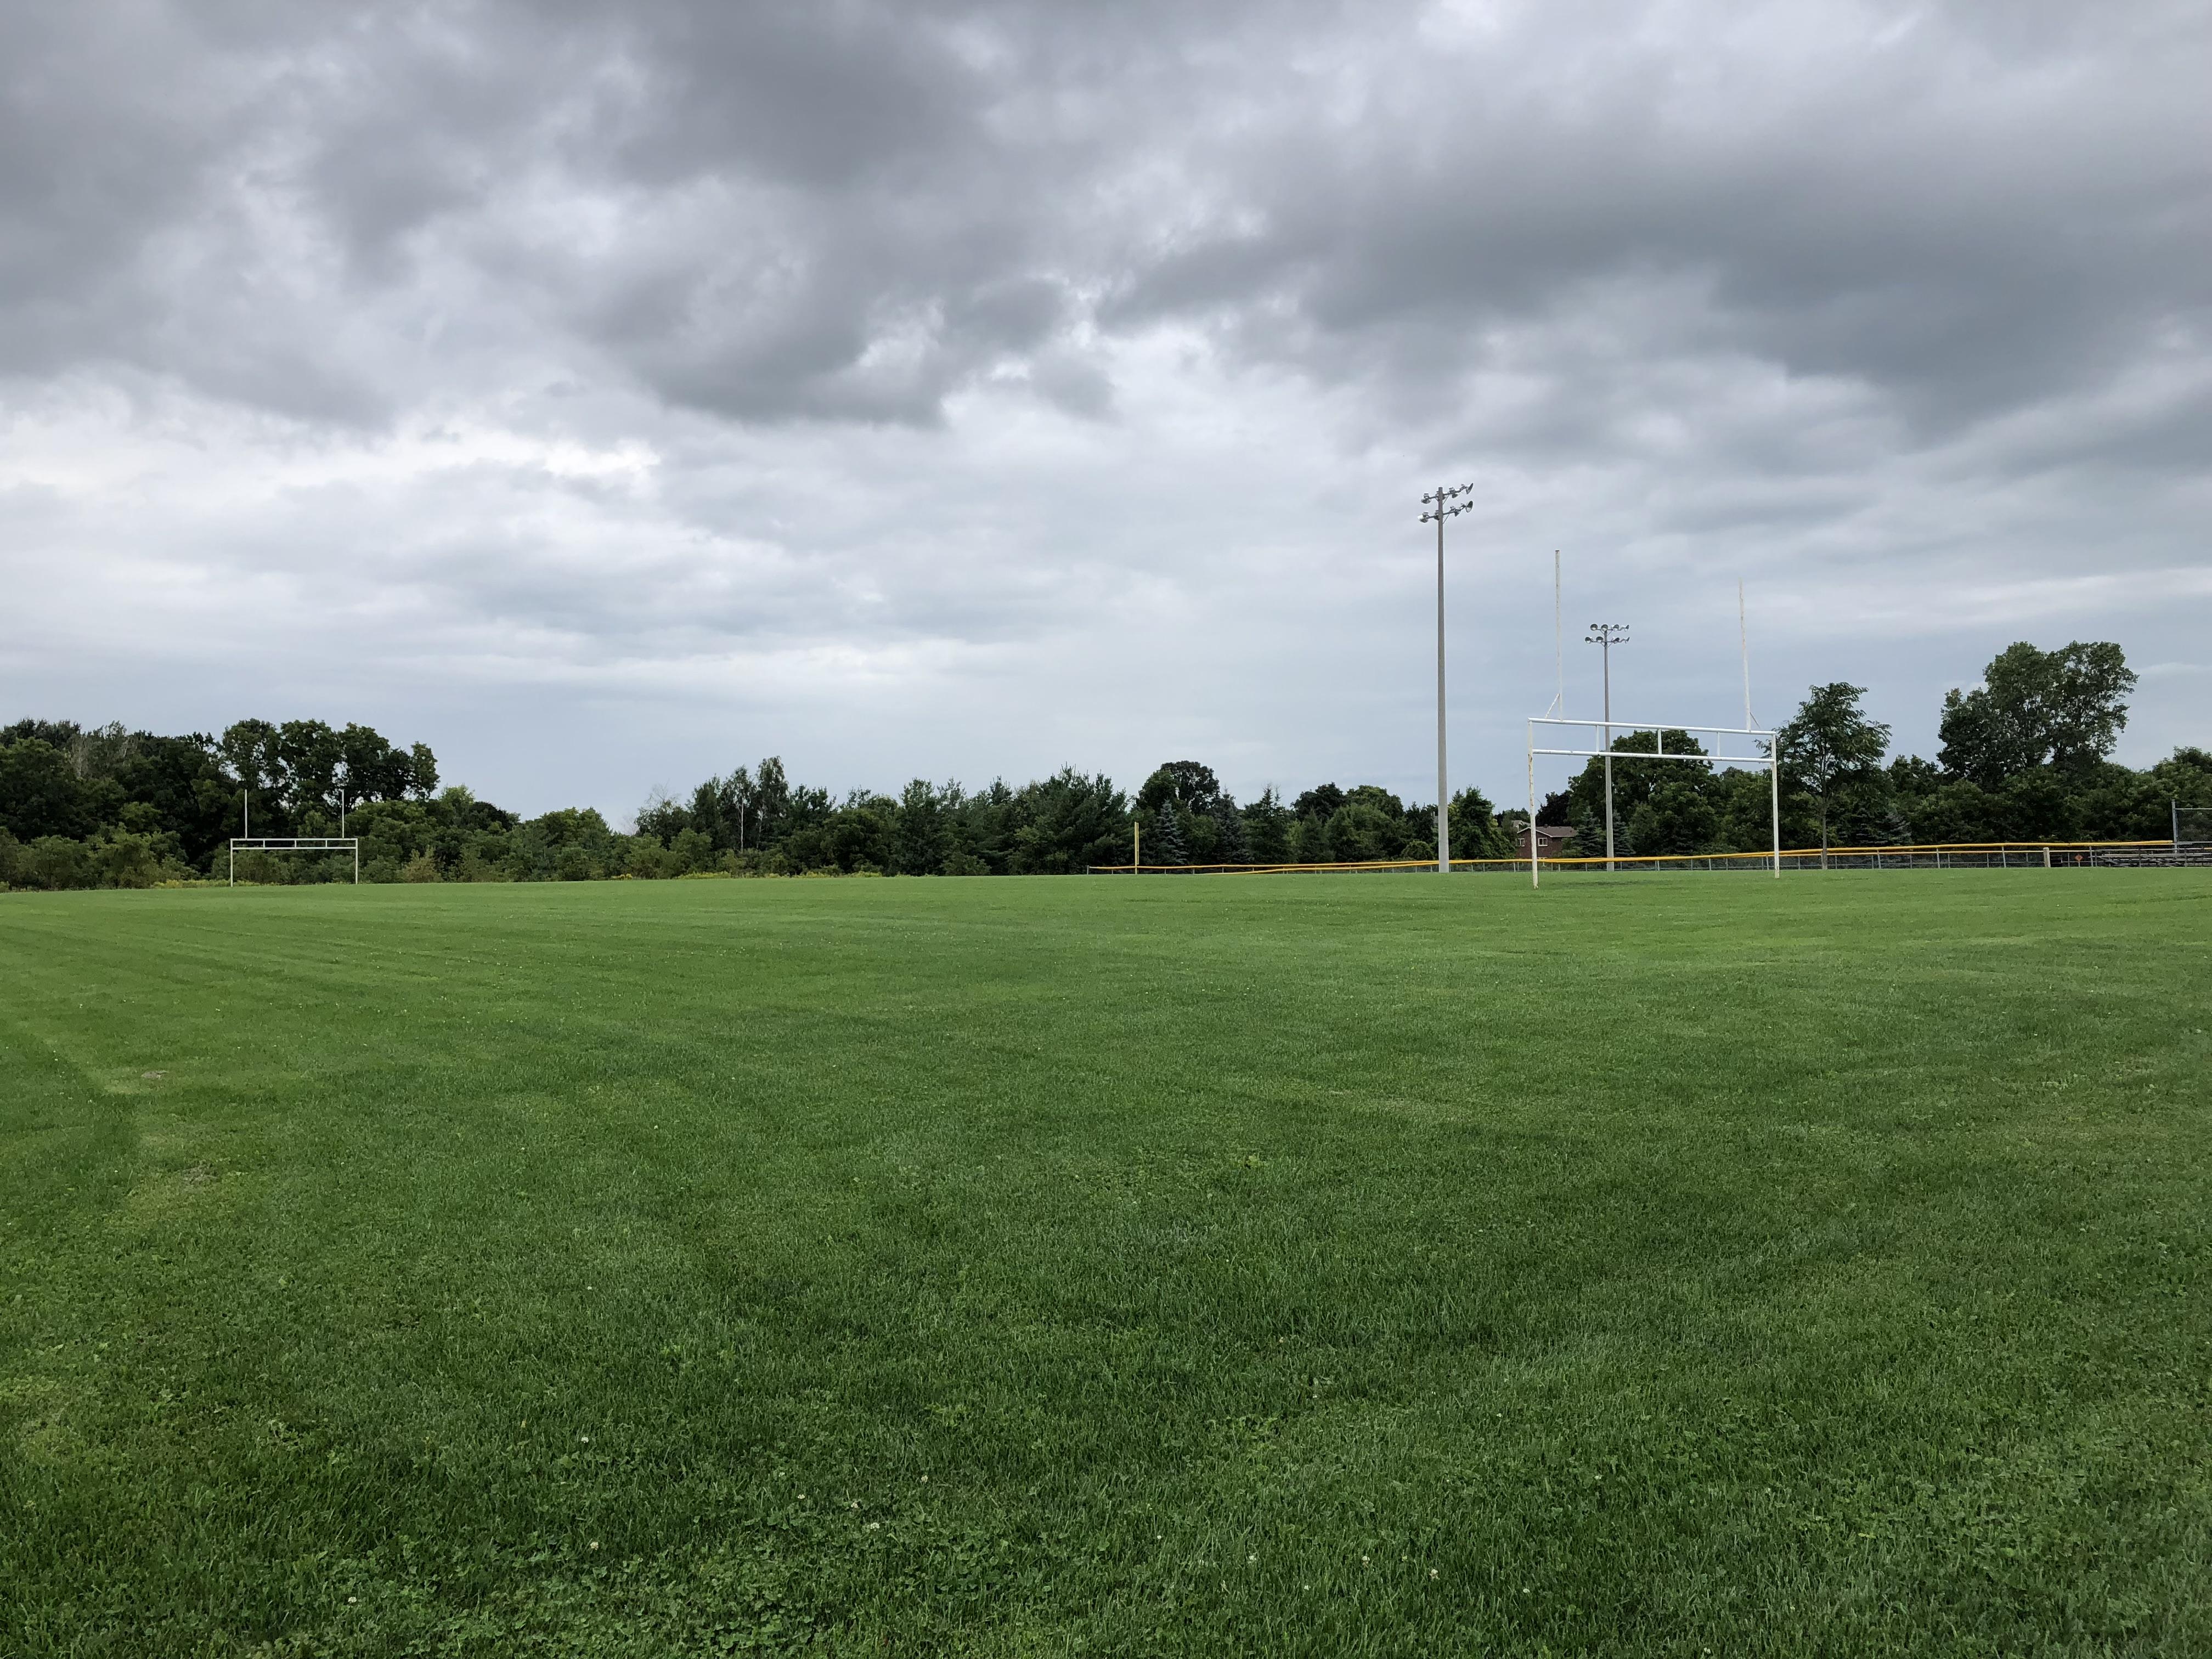 29-08-2018 Jaycee Sports Park (4).JPG